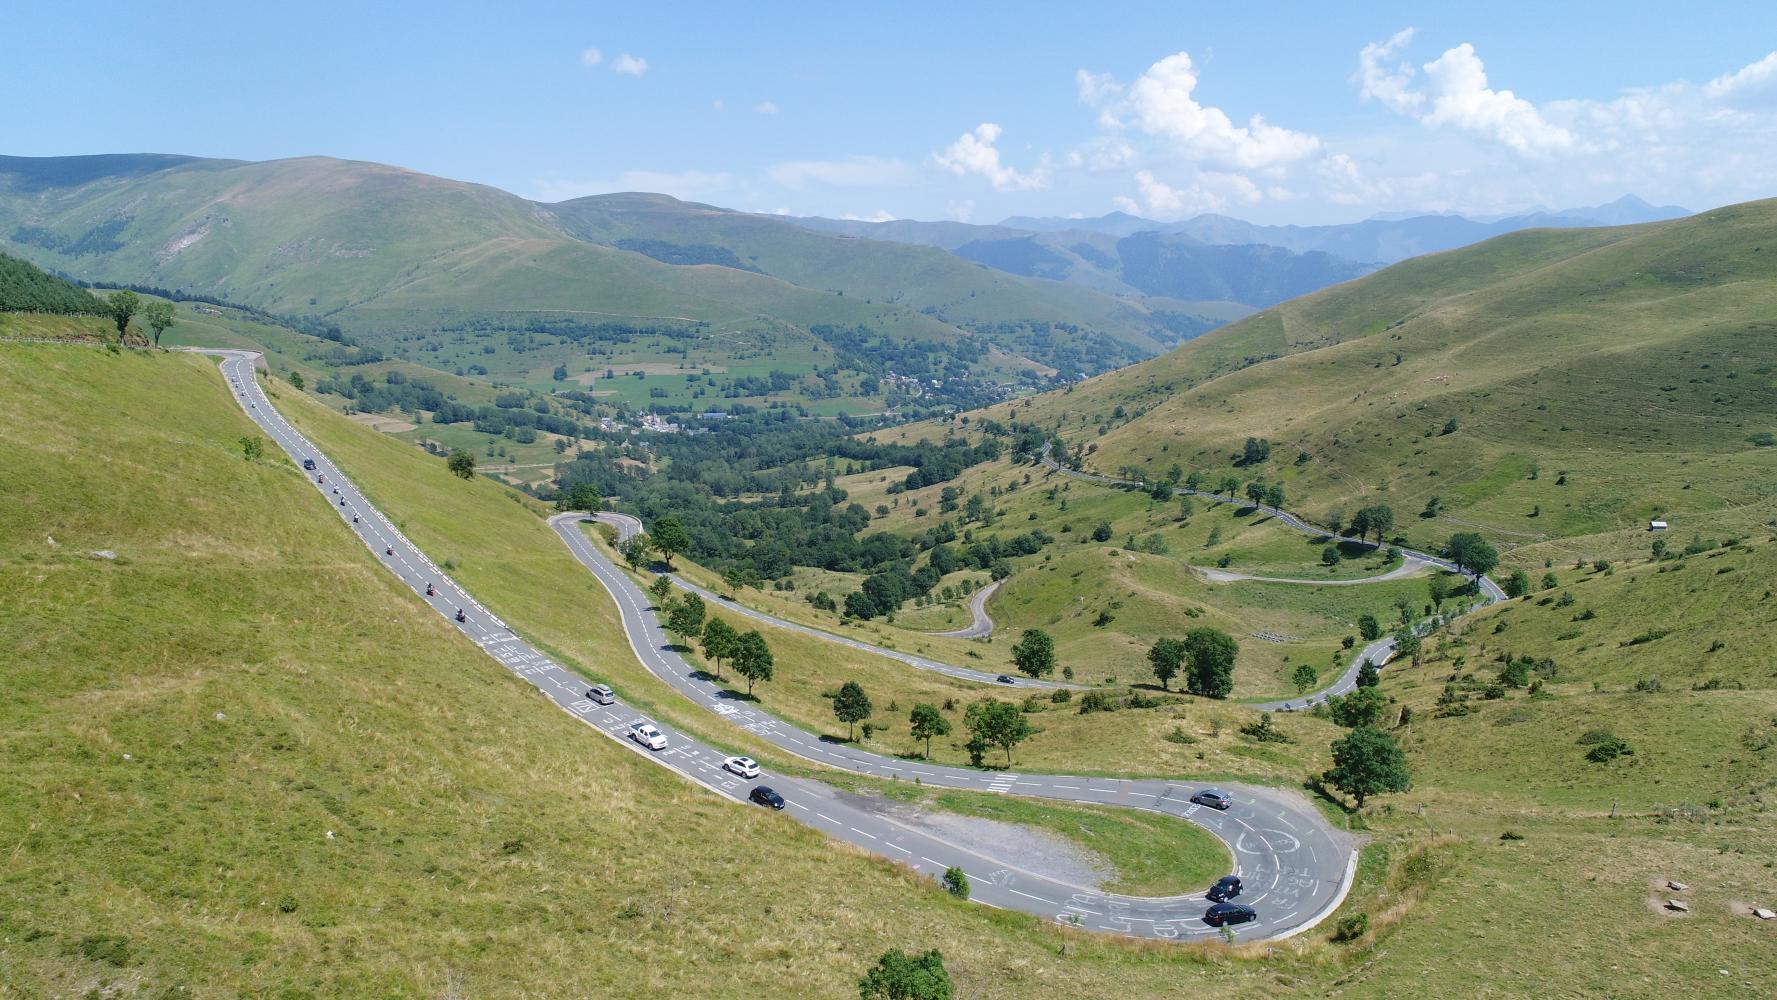 Col de Peyresourde - Bagneres-de-Luchon Bike Climb - PJAMM Cycling